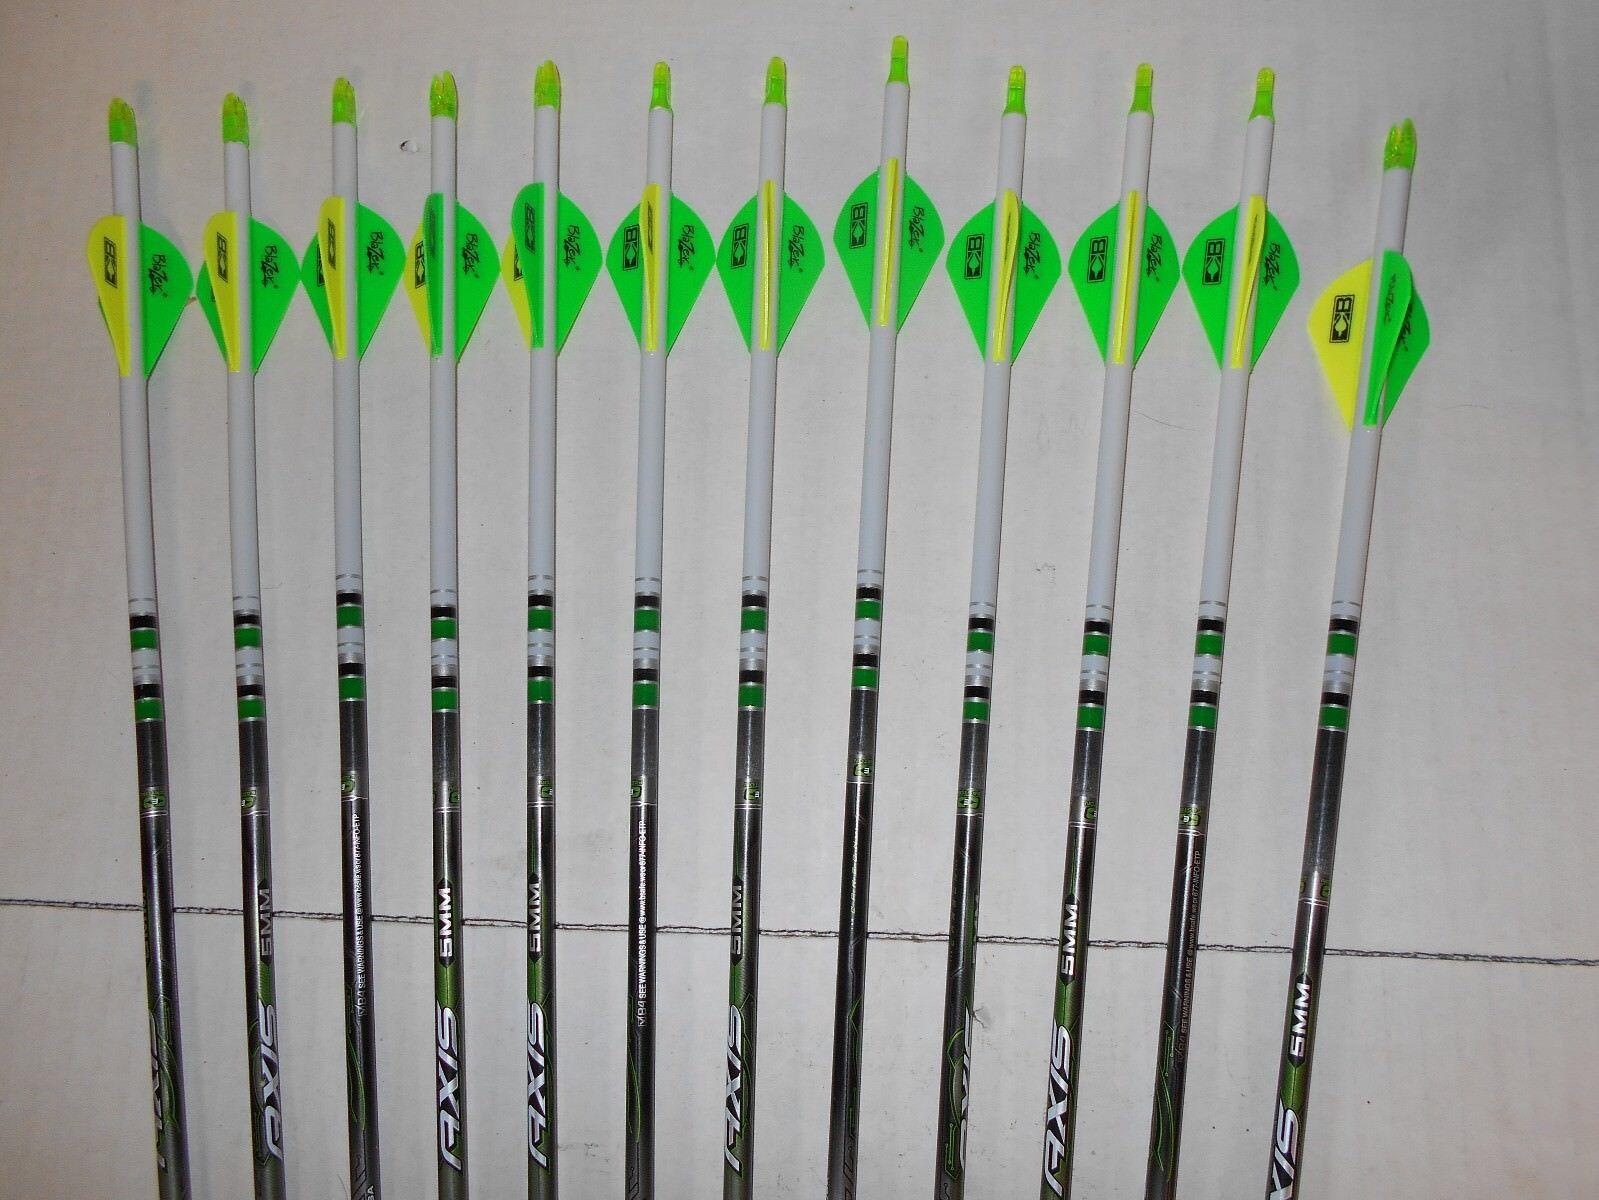 Easton Axis 5mm 500 flechas de carbono de caza  Crestado sumergido Bohning Blazer Paletas